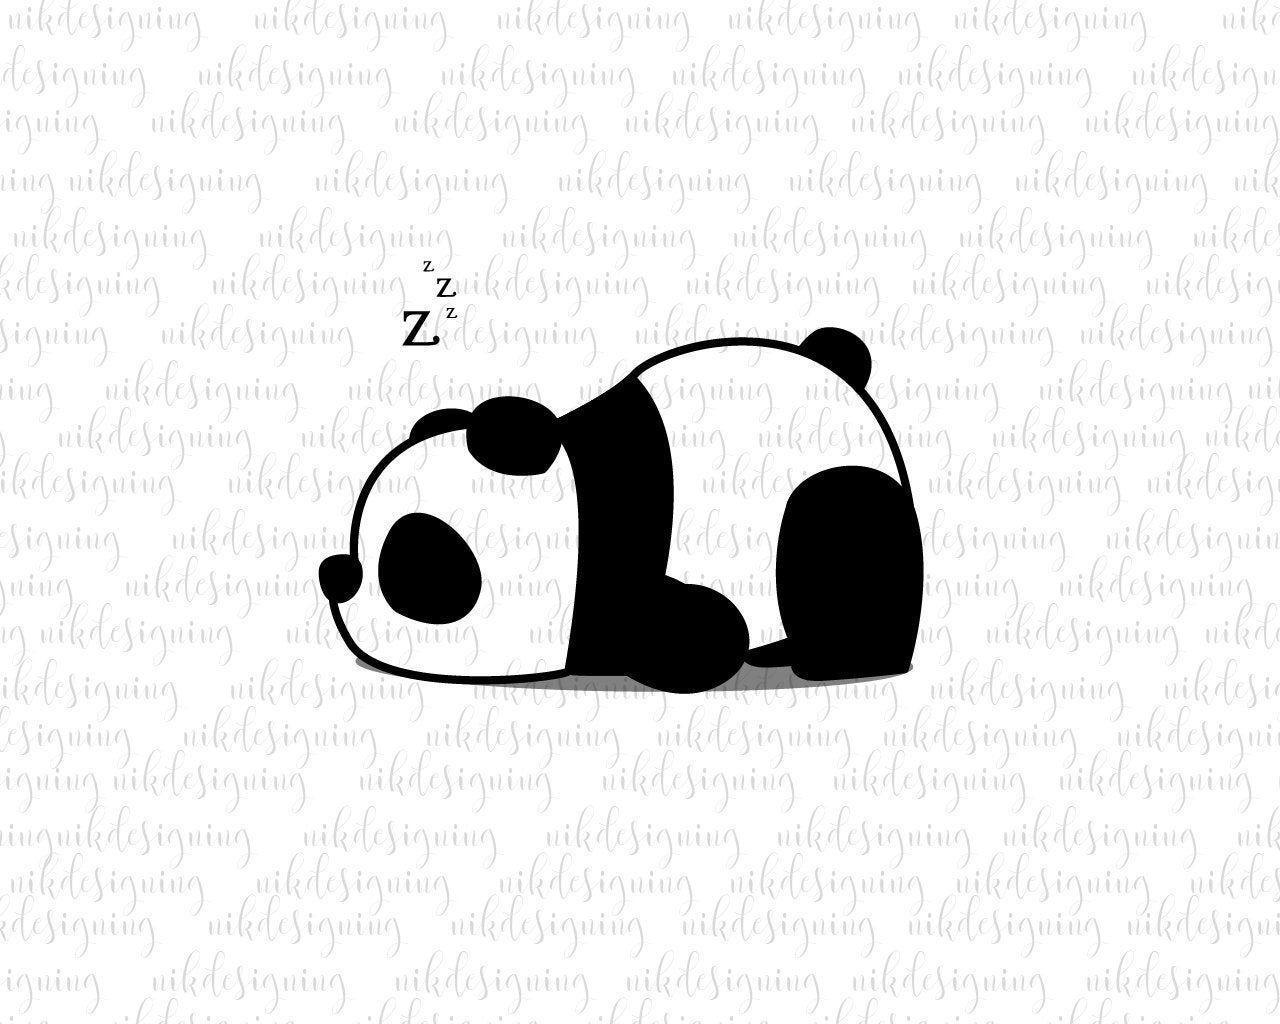 Sleeping Panda Svg Panda Clipart Zoo Svg Animal Svg Panda Svg Svg Eps Instant Download Cute Panda Drawing Panda Drawing Panda Sketch